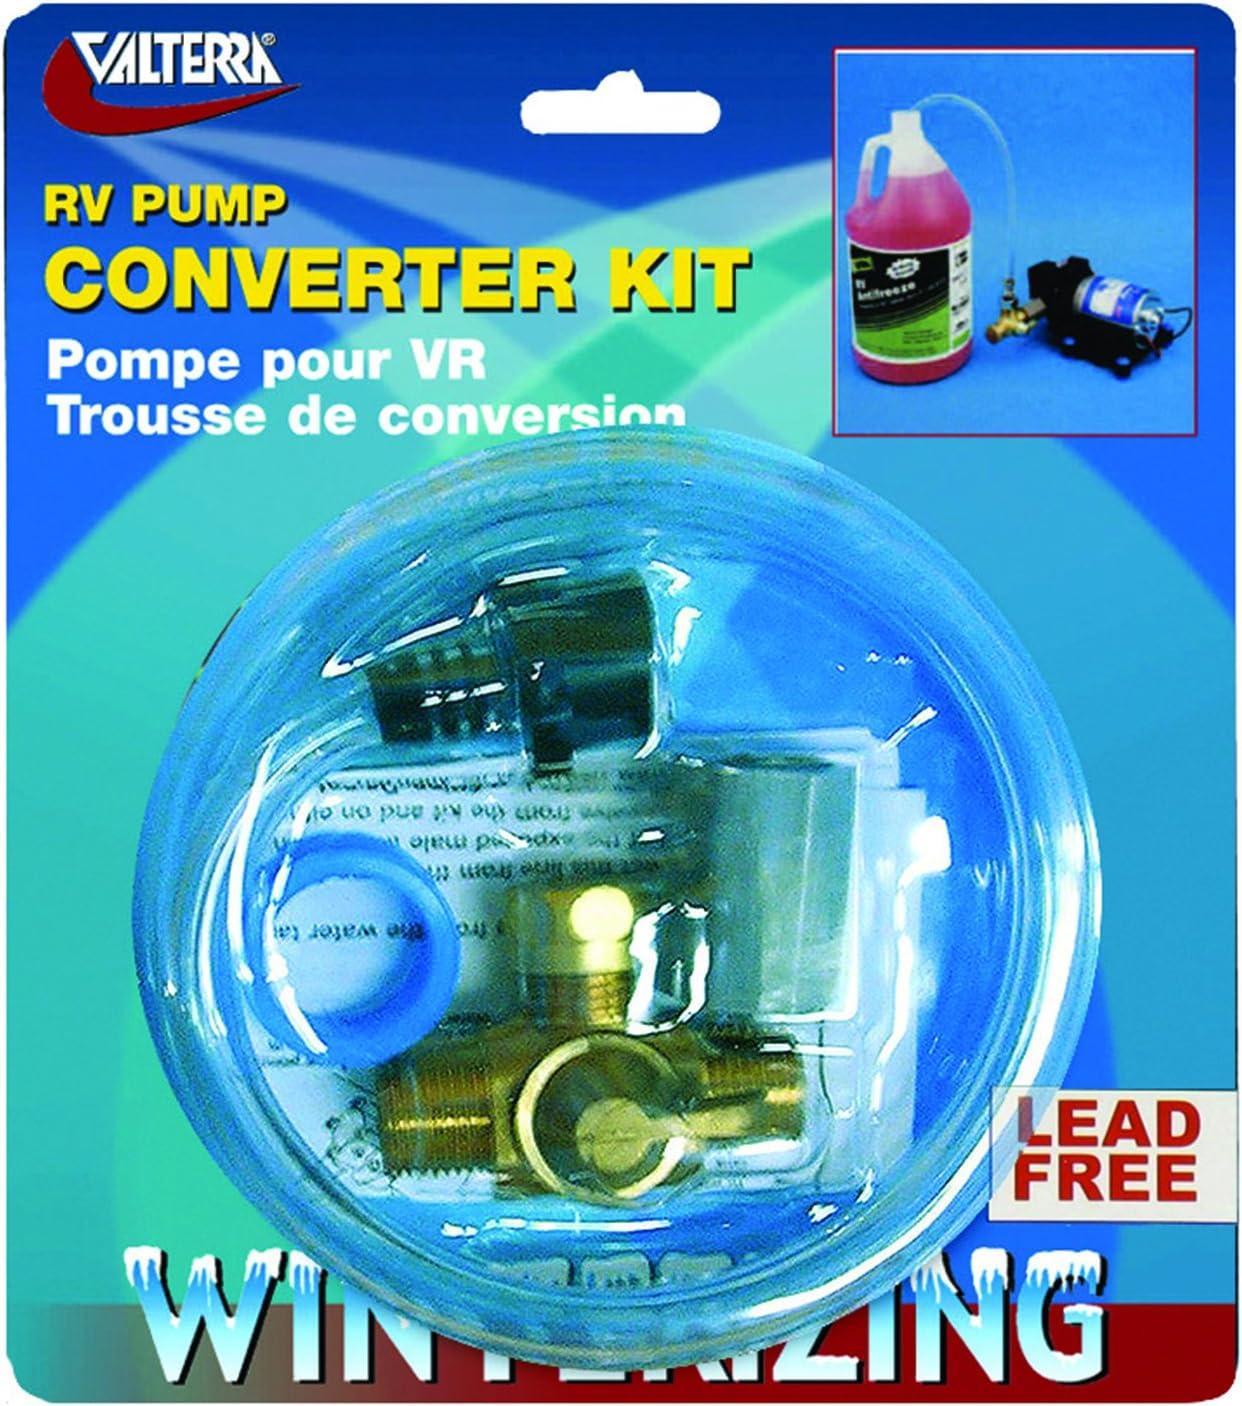 RV Pump Converter Winterizing Kit Water Pipe Set Cleaning Hose Valve Siphon